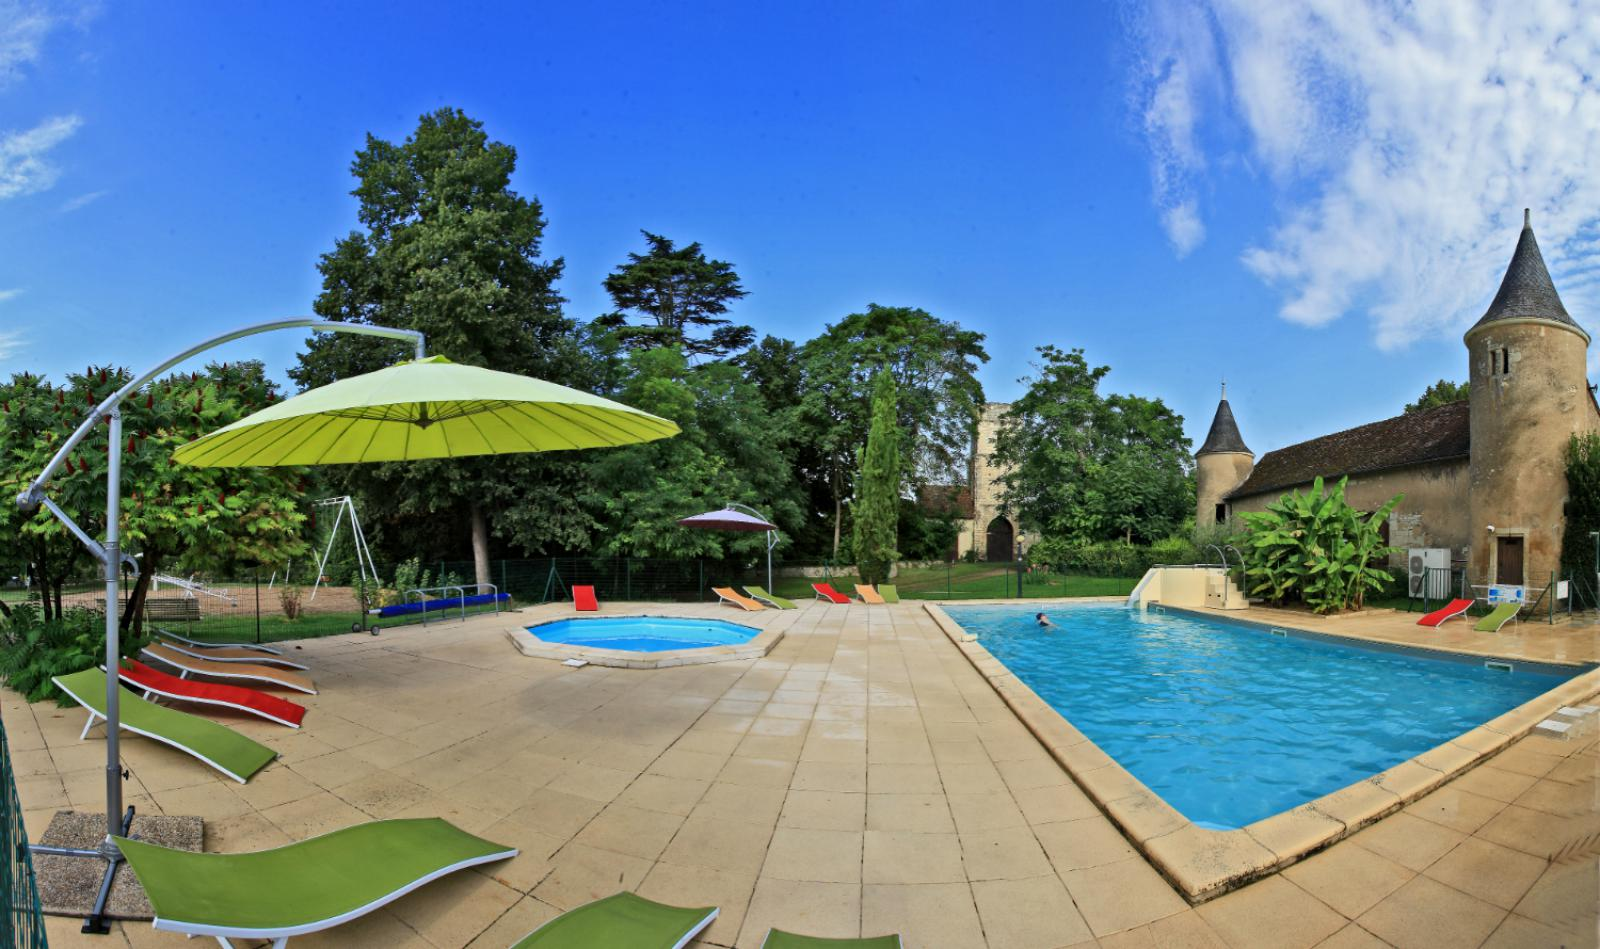 Castel Camping Le Petit Trianon hébergement futuroscope piscine chauffée